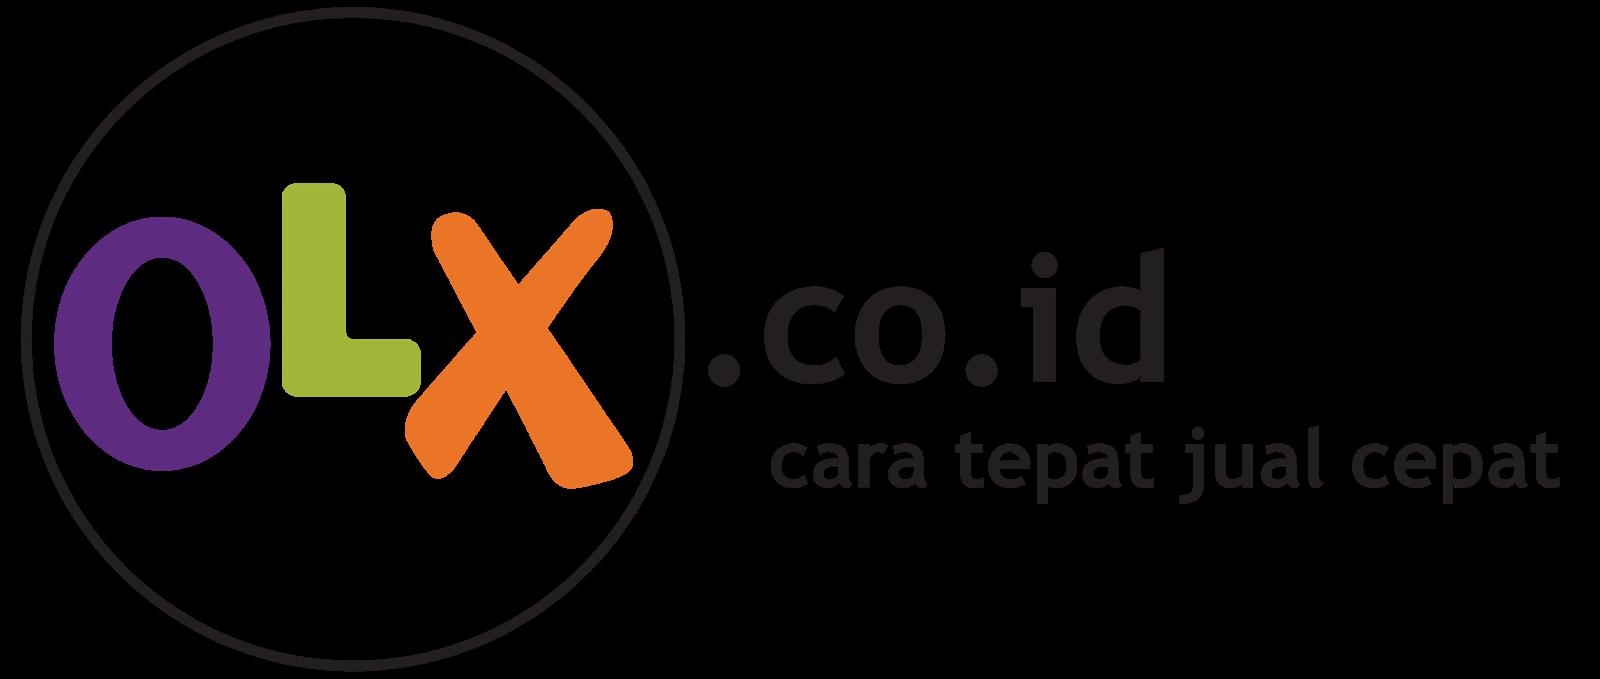 OLX Indonesia (sebelumnya bernama tokobagus.com dan berniaga.com) adalah sebuah  situs web iklan baris di Indonesia yang difokuskan untuk membeli dan  menjual ... 179ecf9d4e